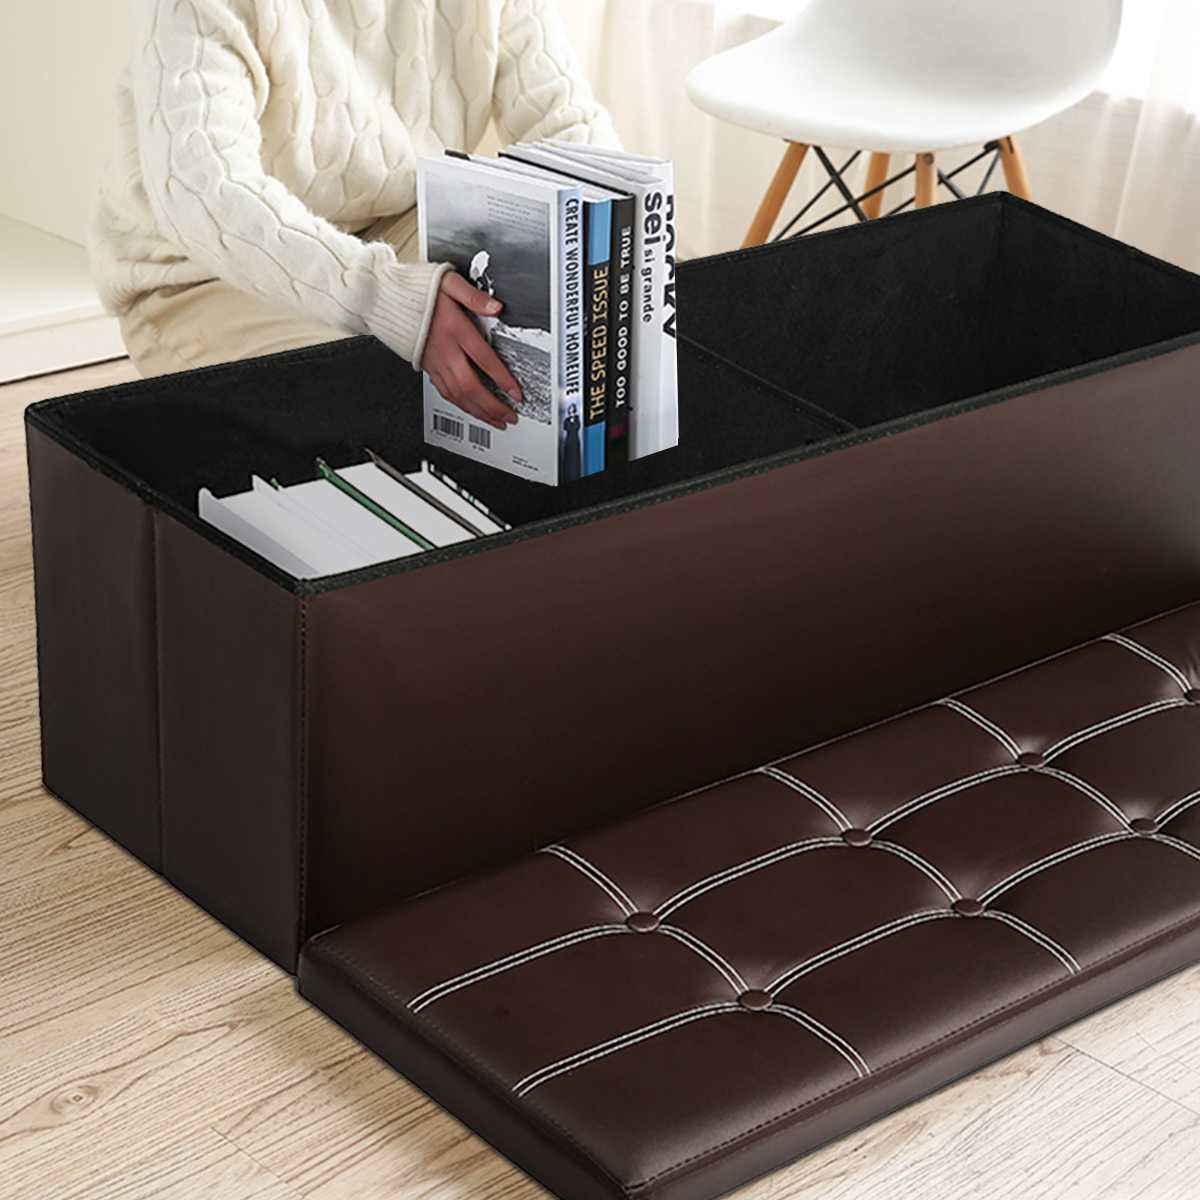 Rectangular Storage Stool Storage Stool Can Sit Adult Sofa Stool Household Storage Chair Folding Storage Box